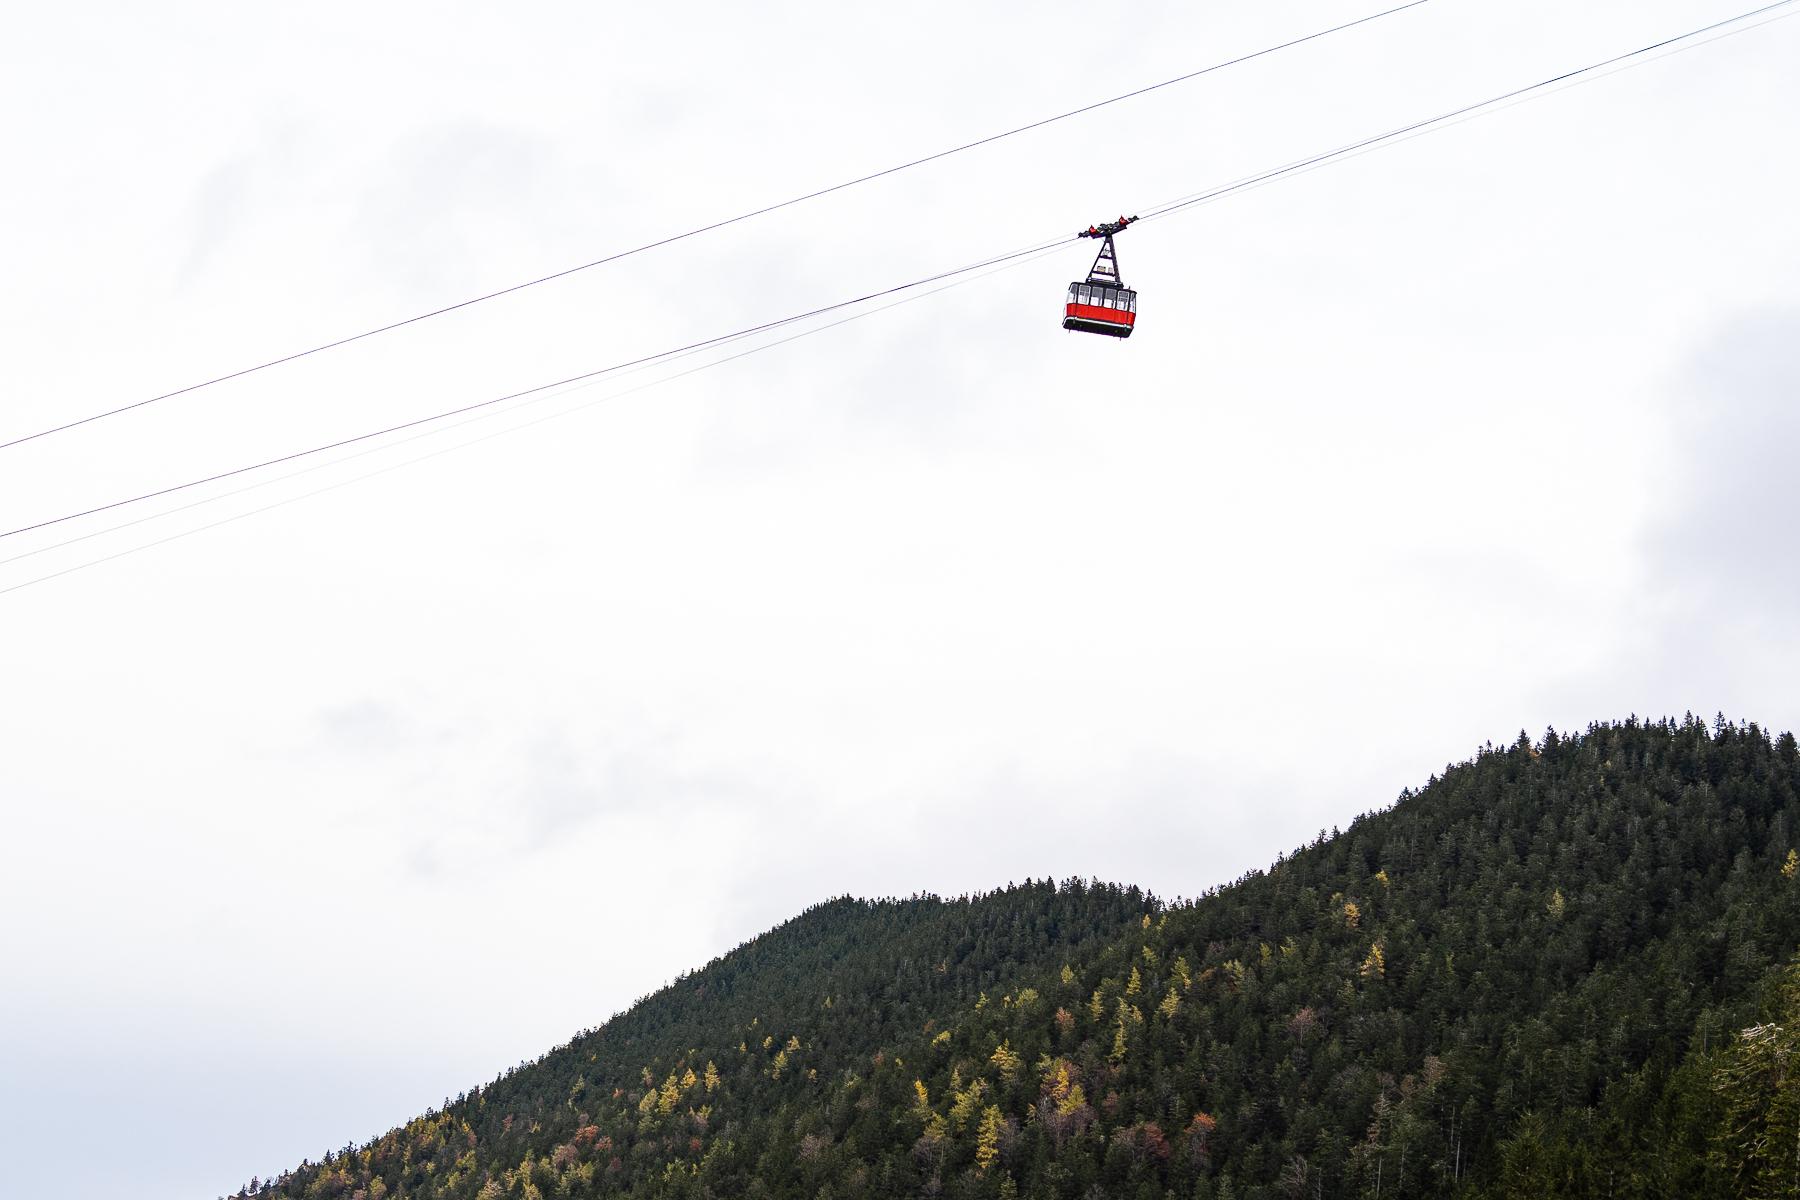 Bergbahnen im Mangfallgebirge